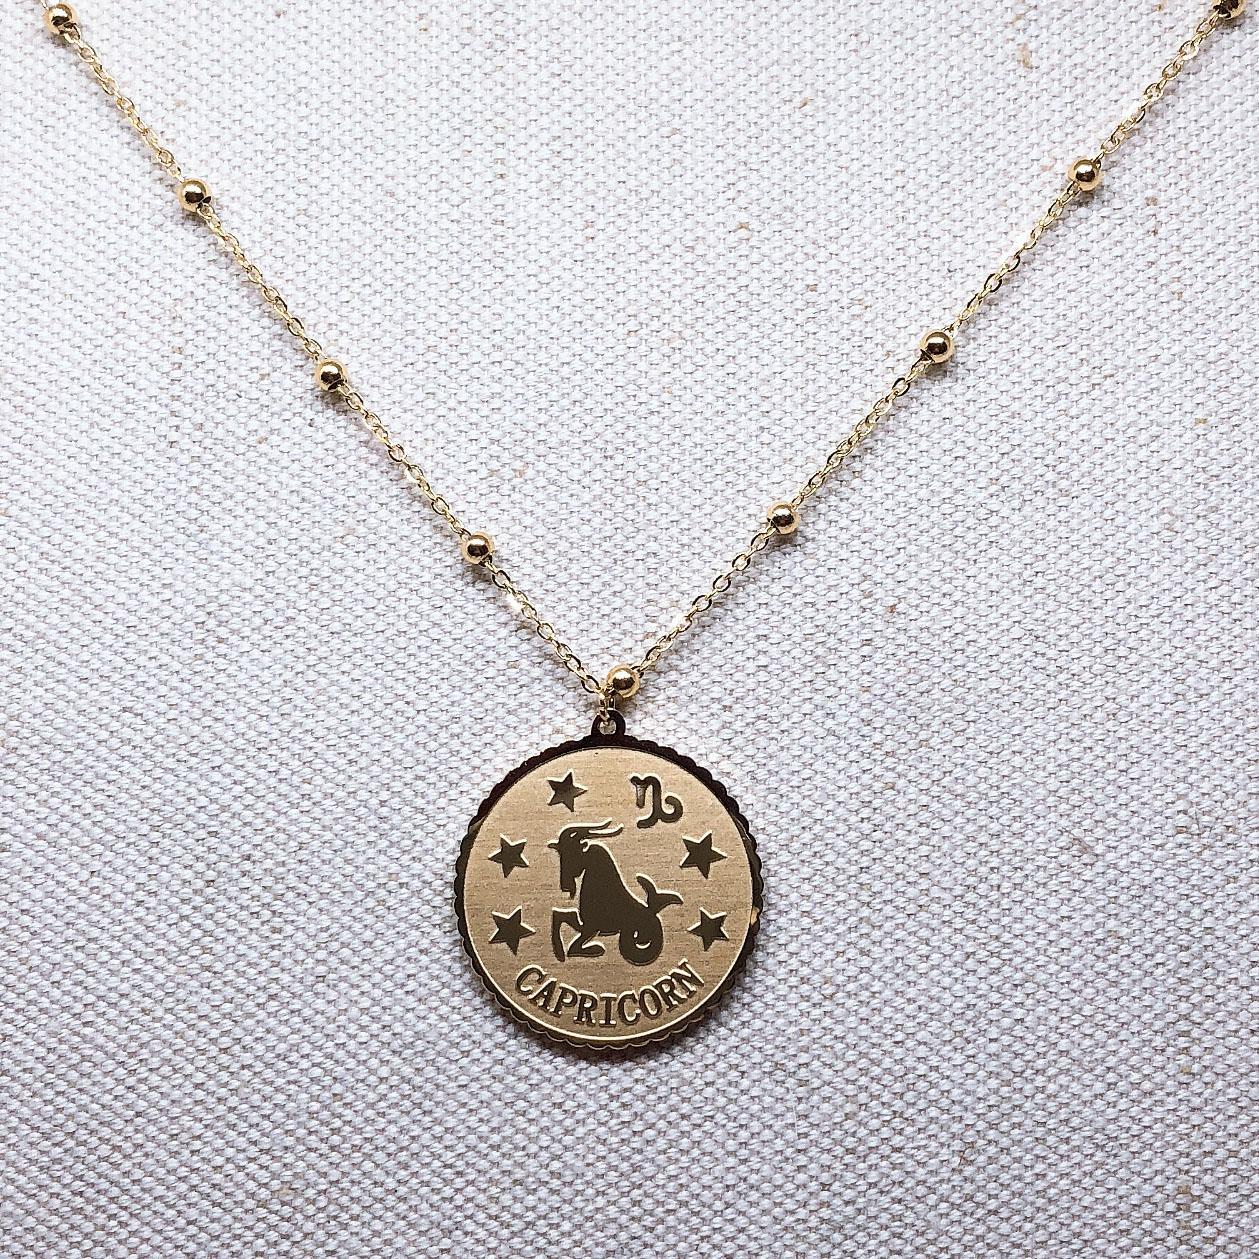 collier-femme-or-capricorne